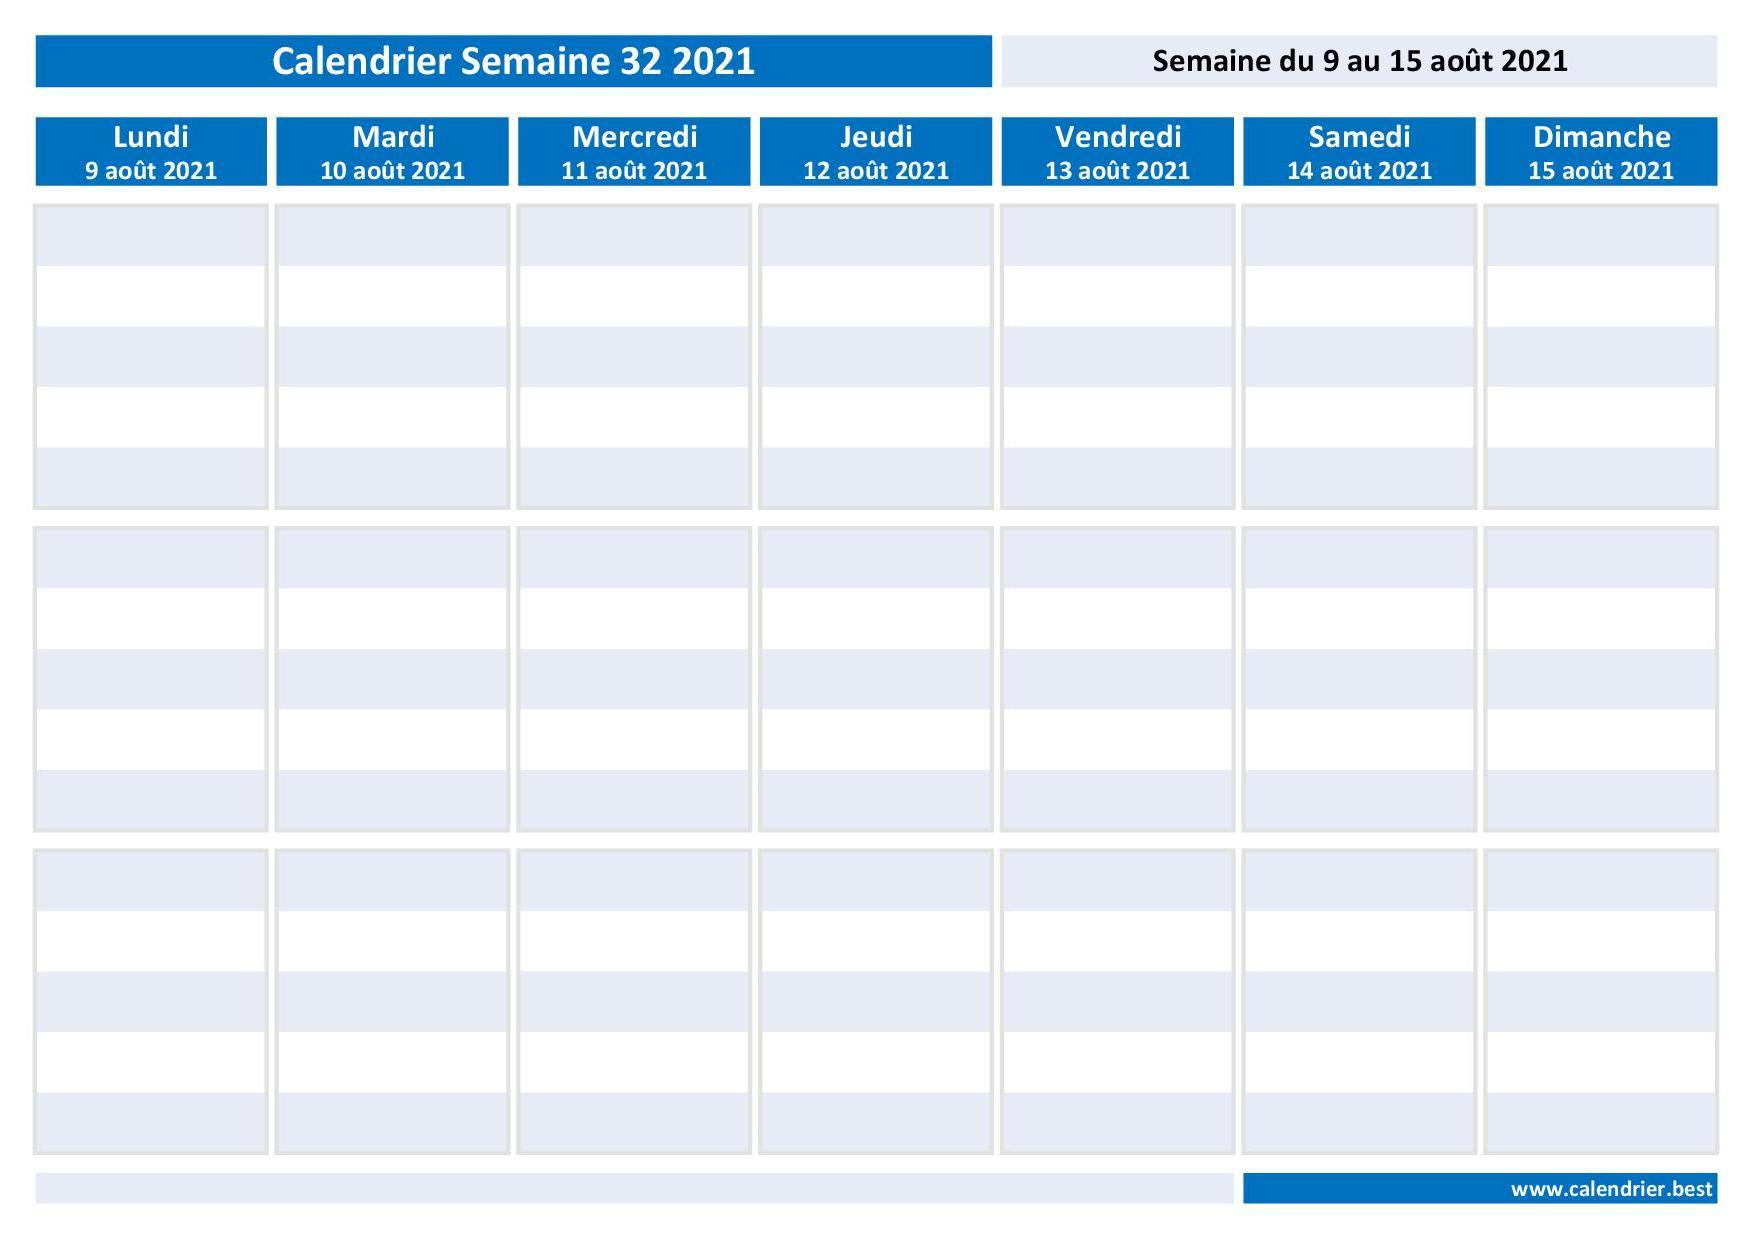 Semaine 32 2021 : dates, calendrier et planning  Calendrier.best